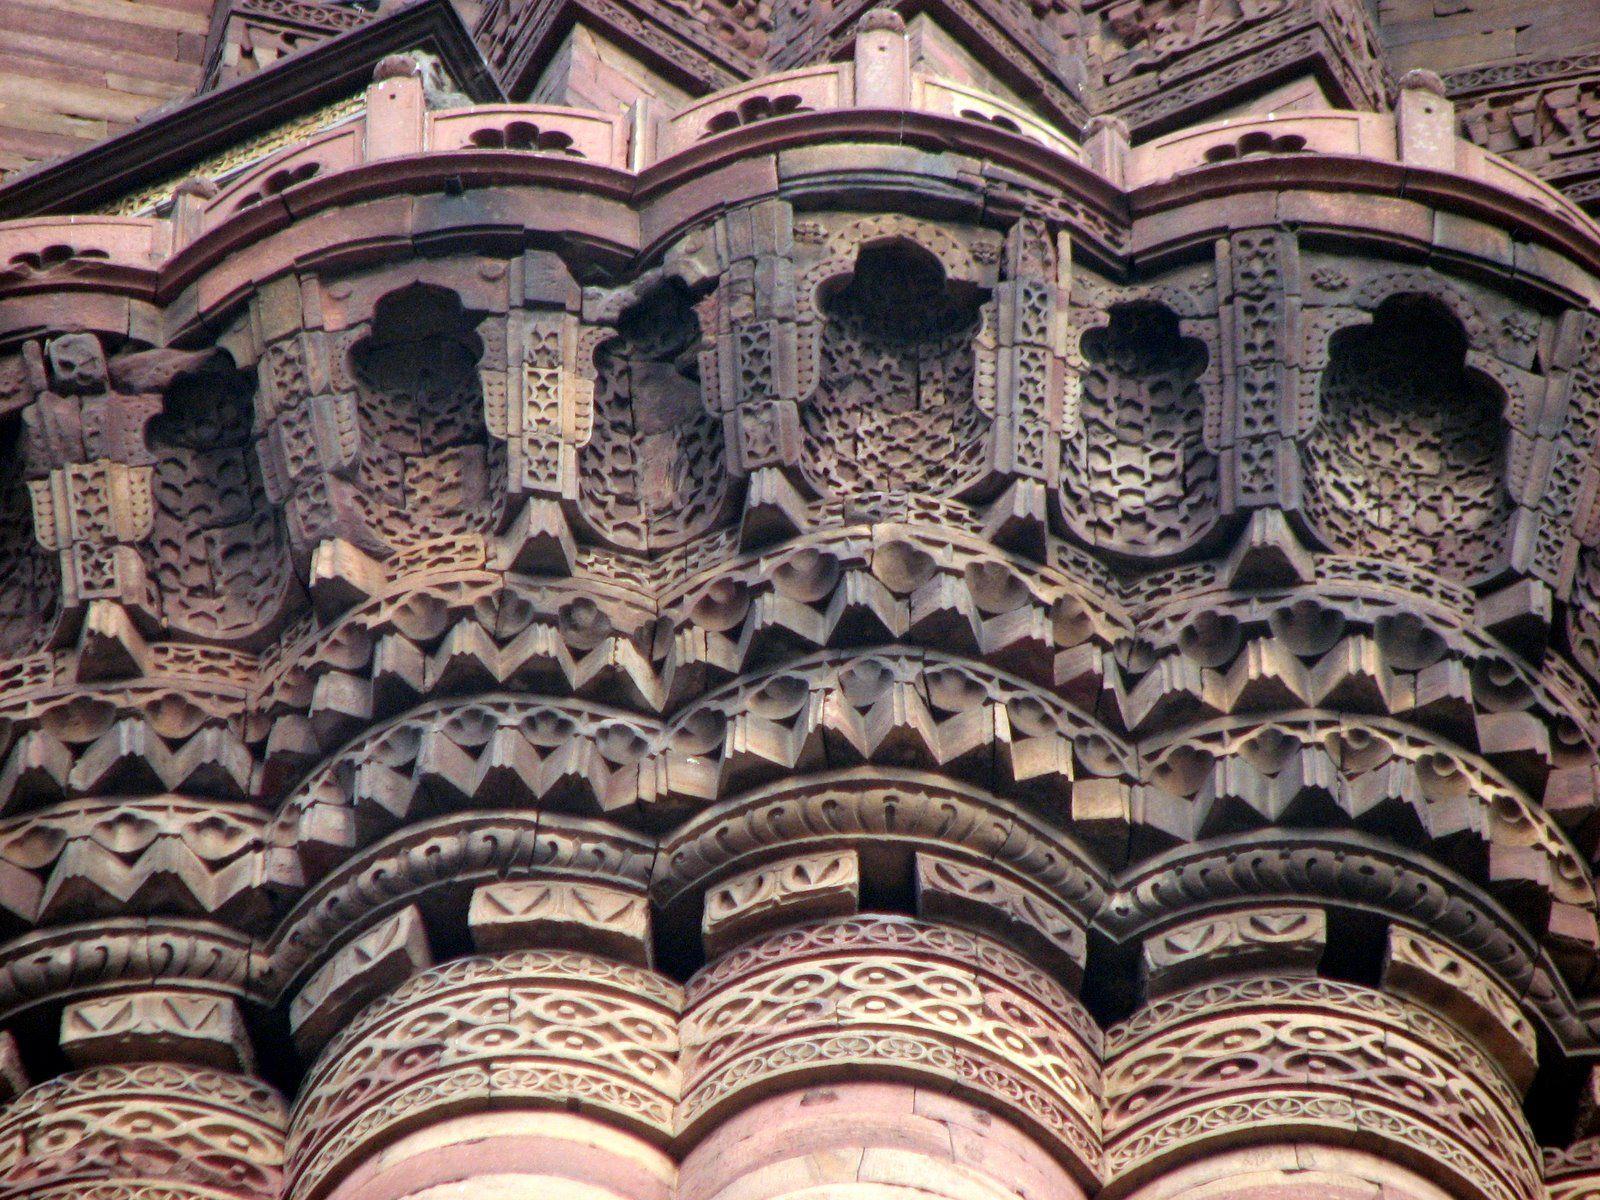 Details of Muqarnas corbel balcony. | ARTS 1 | Pinterest | Balconies